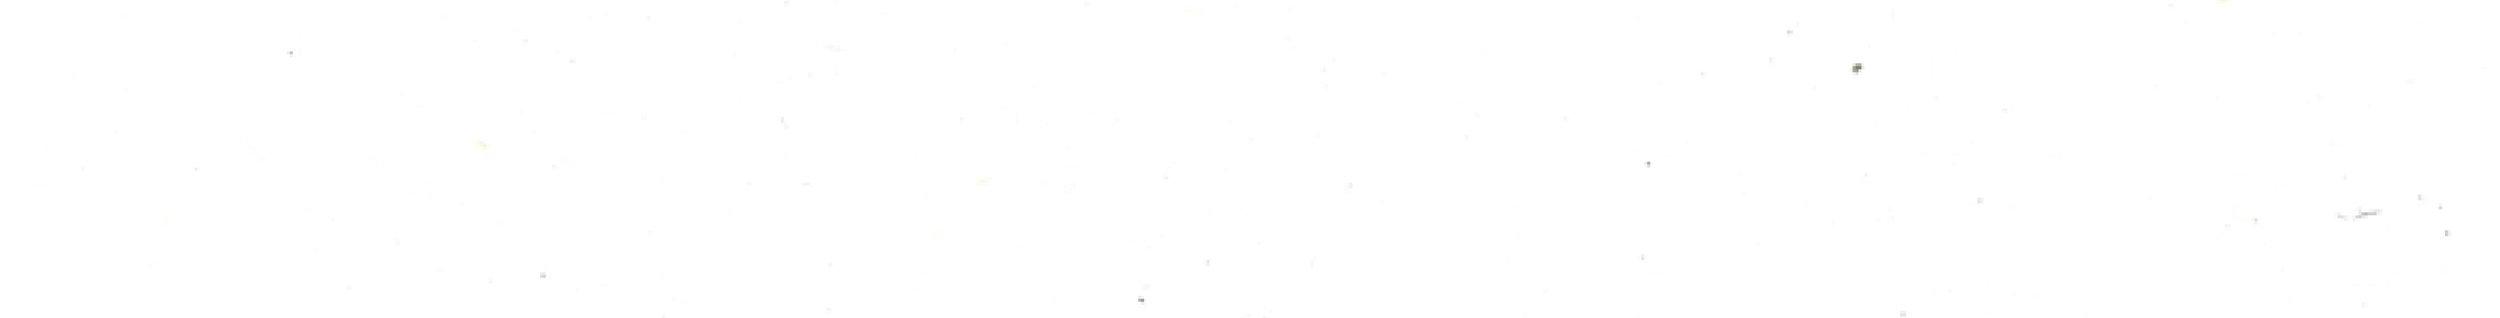 viviana-Troya-blank3.jpg